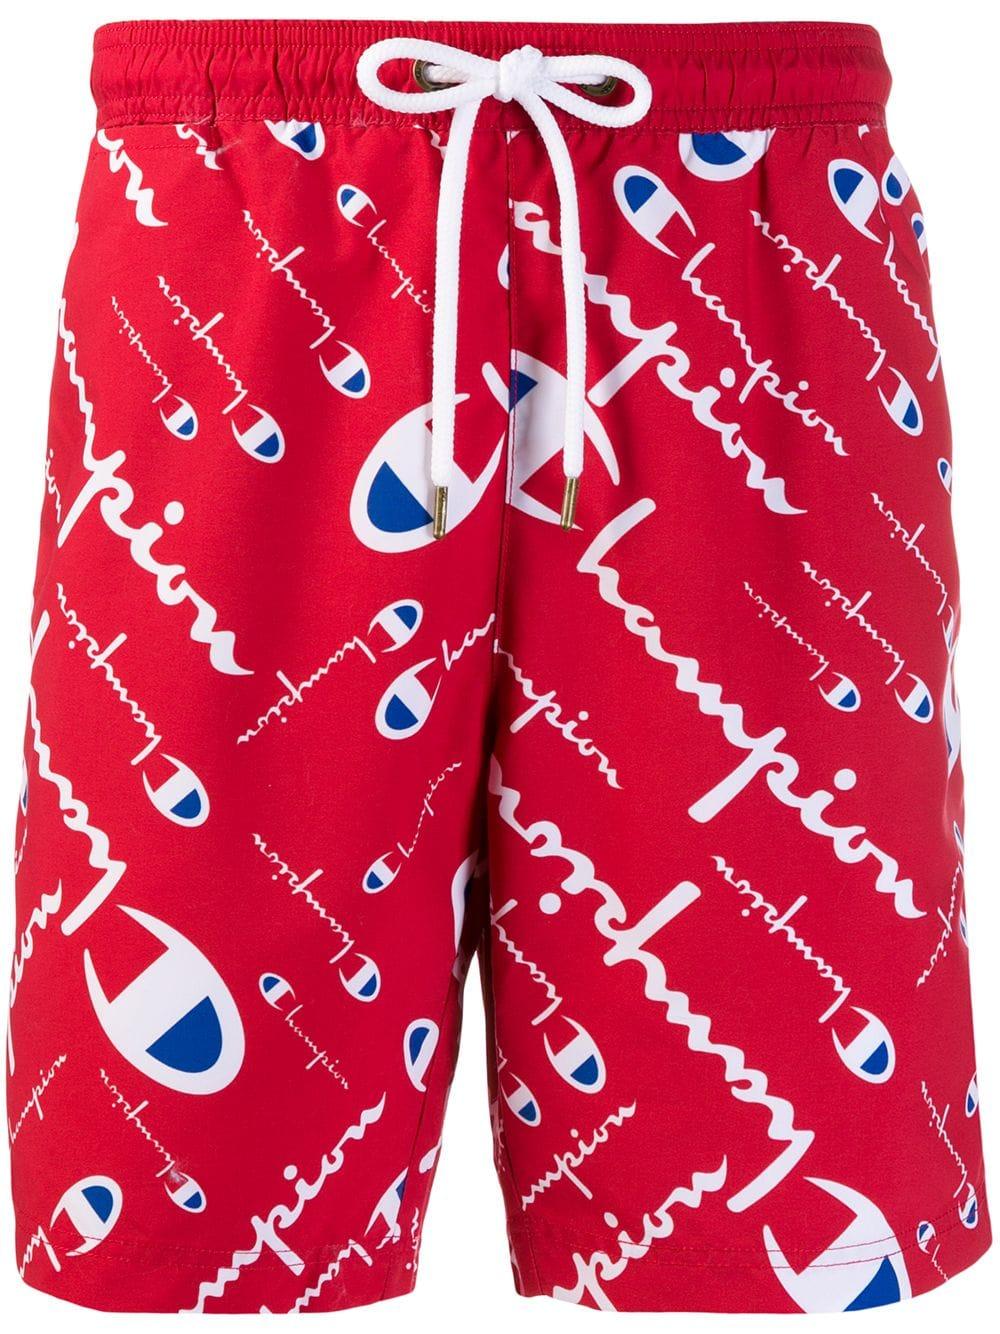 Red Heart Mens Running Casual Short Beach Pants Swim Trunks Drawstring Board Shorts Swimwear